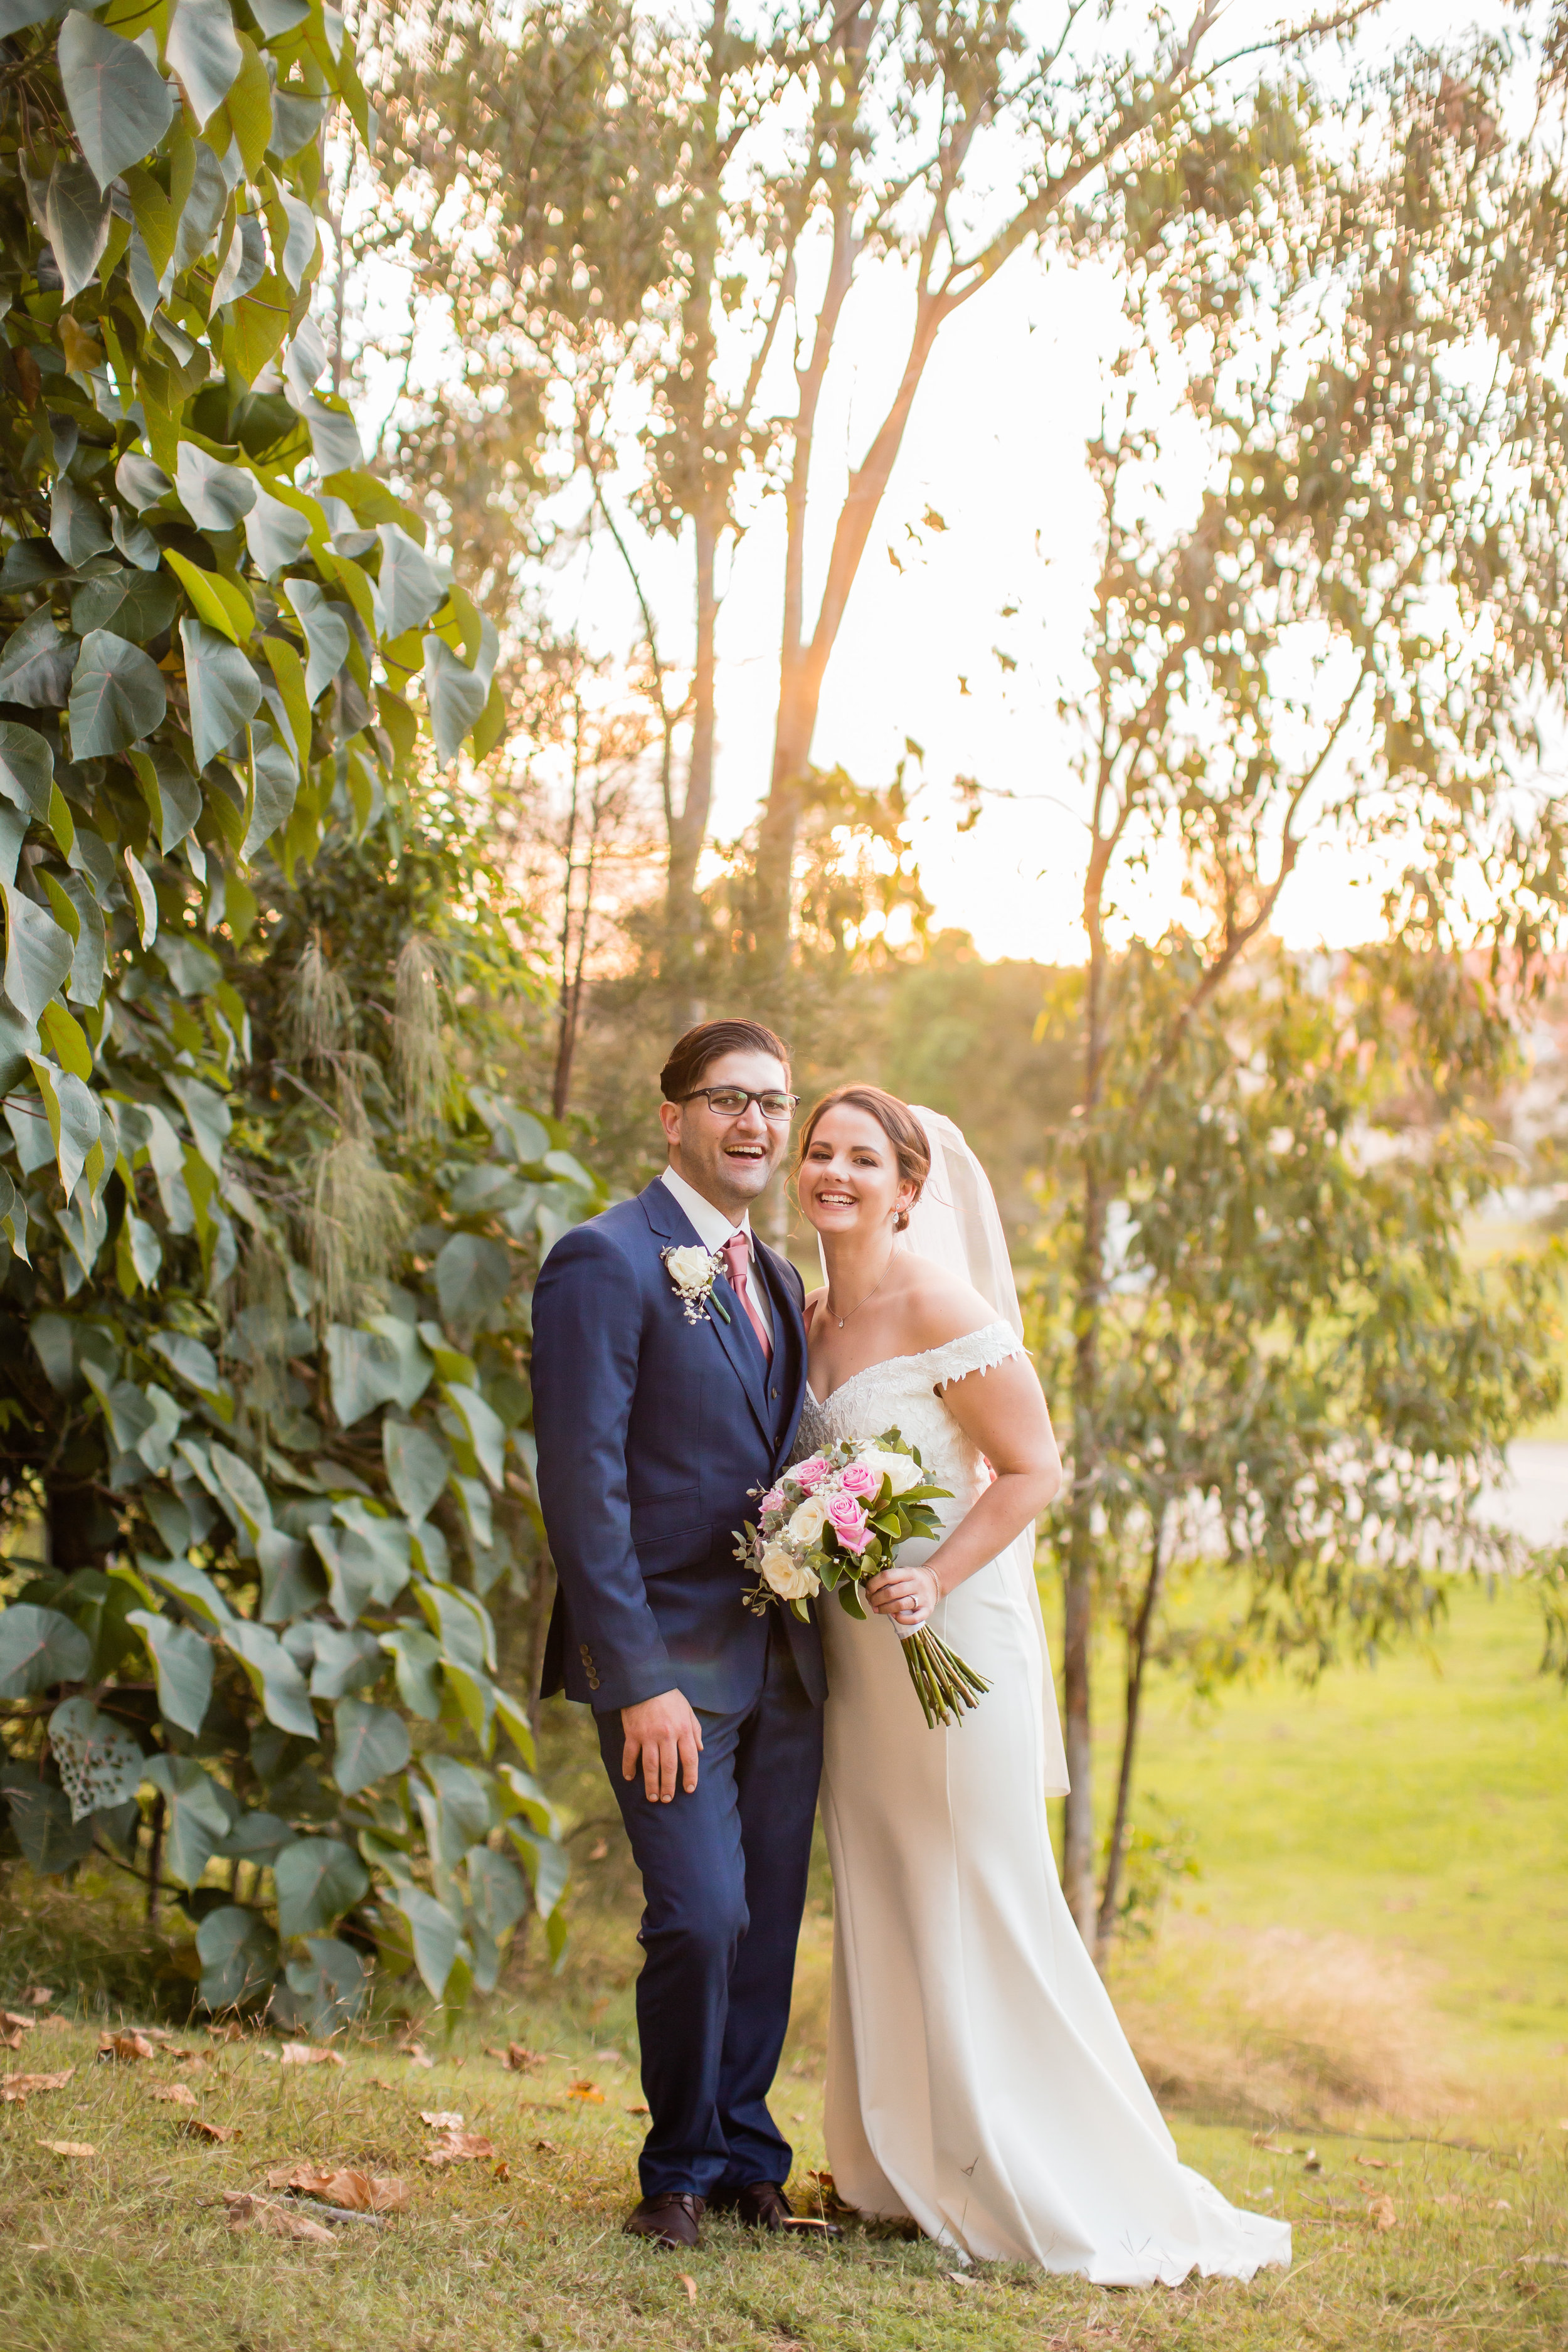 Raw Design Media wedding photographer